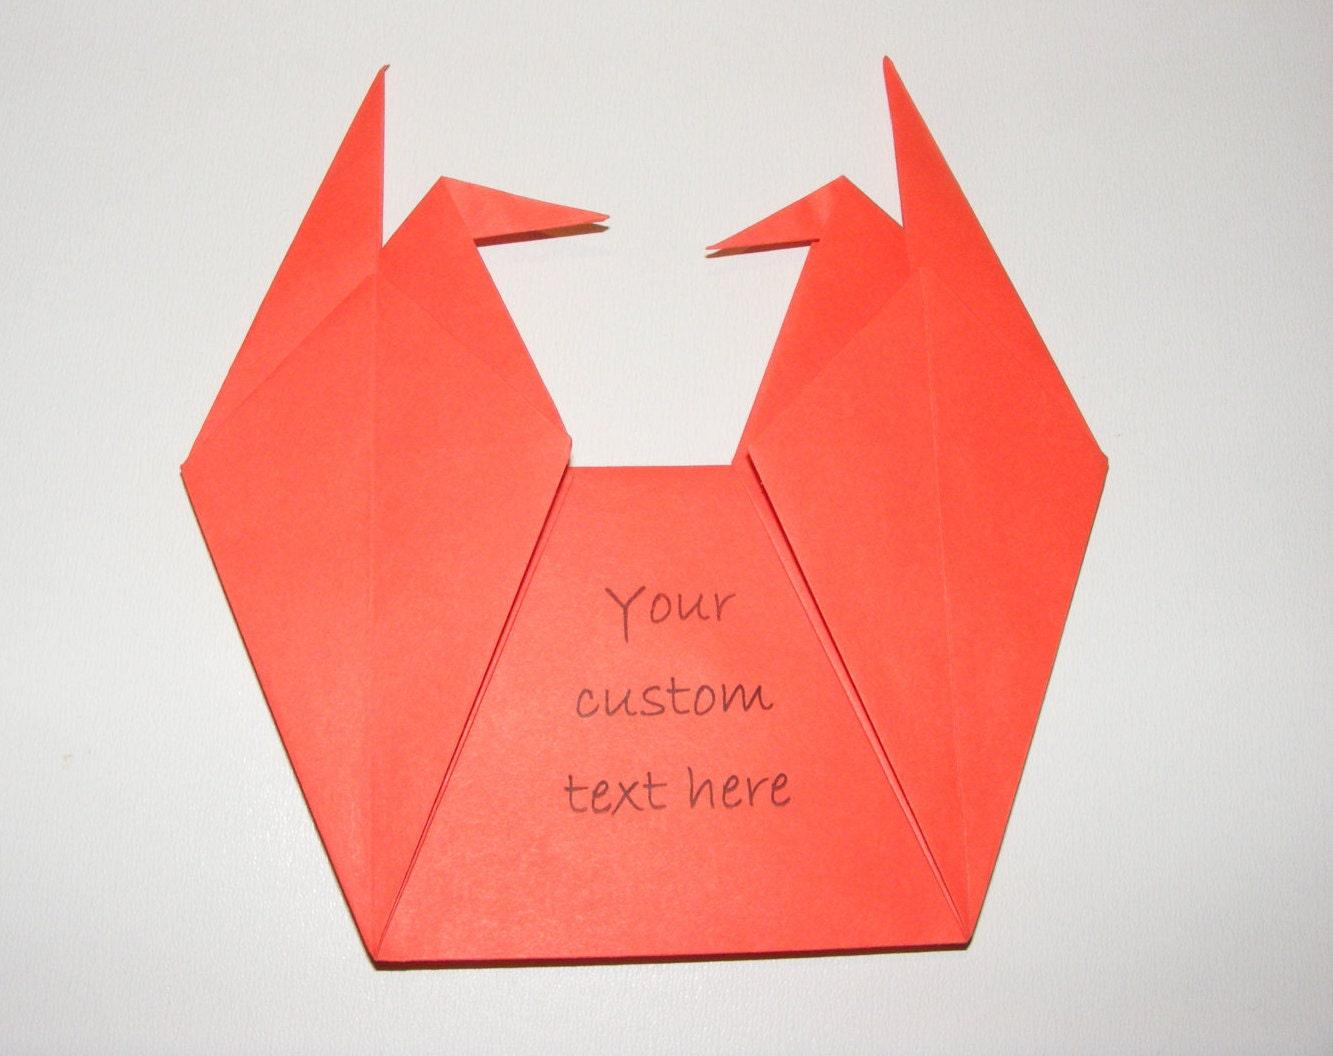 Origami envelope for wedding invitation Envelope for baby - photo#27